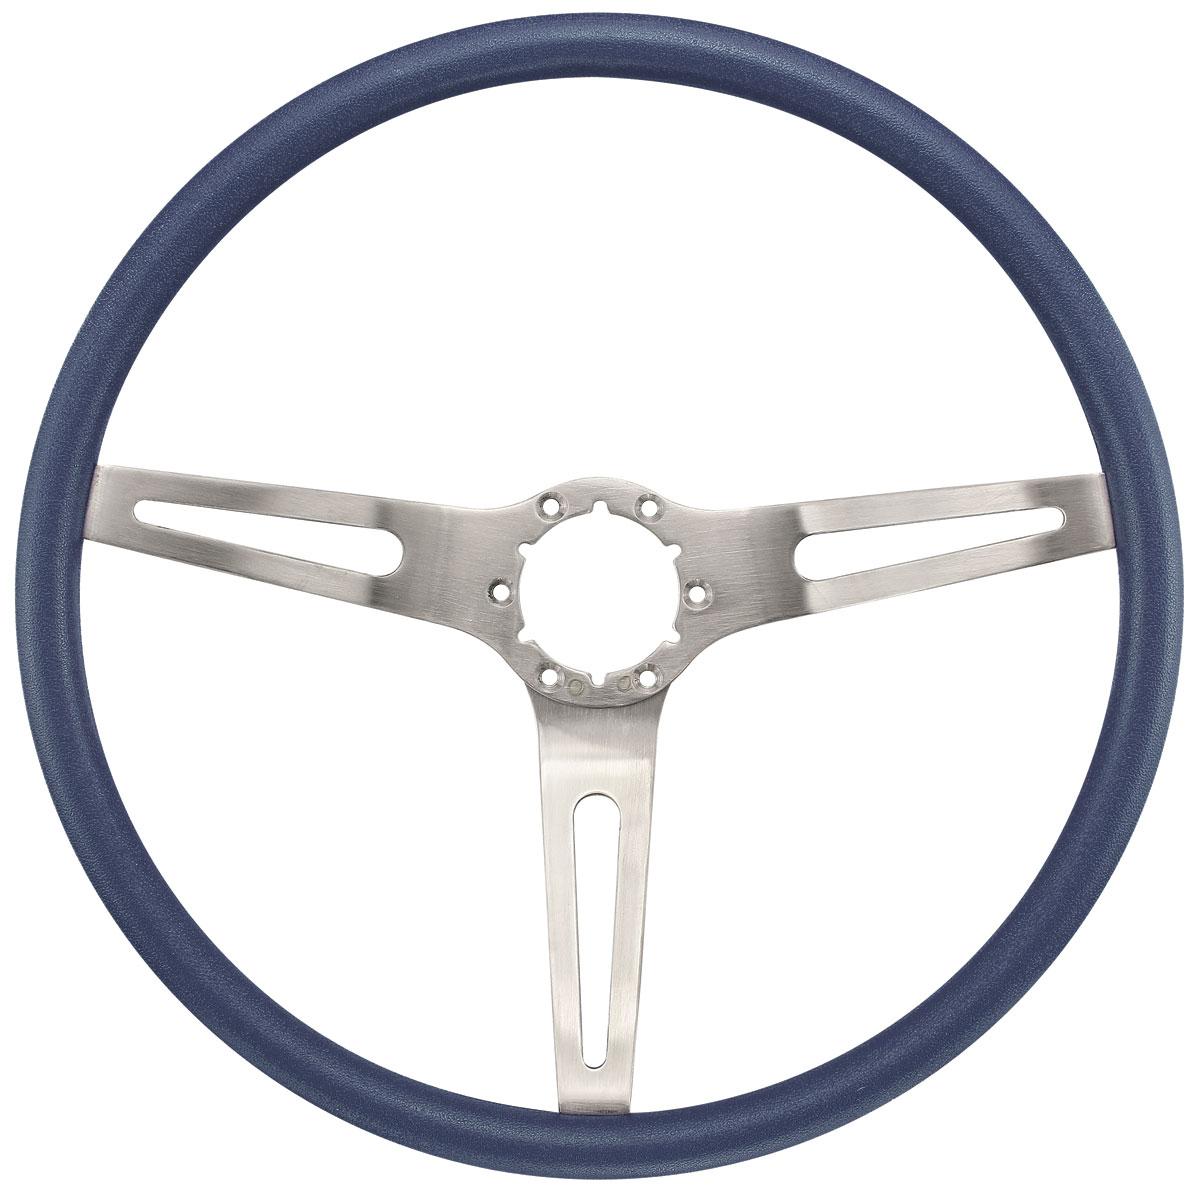 Photo of Steering Wheel, Three-Spoke Specify Color